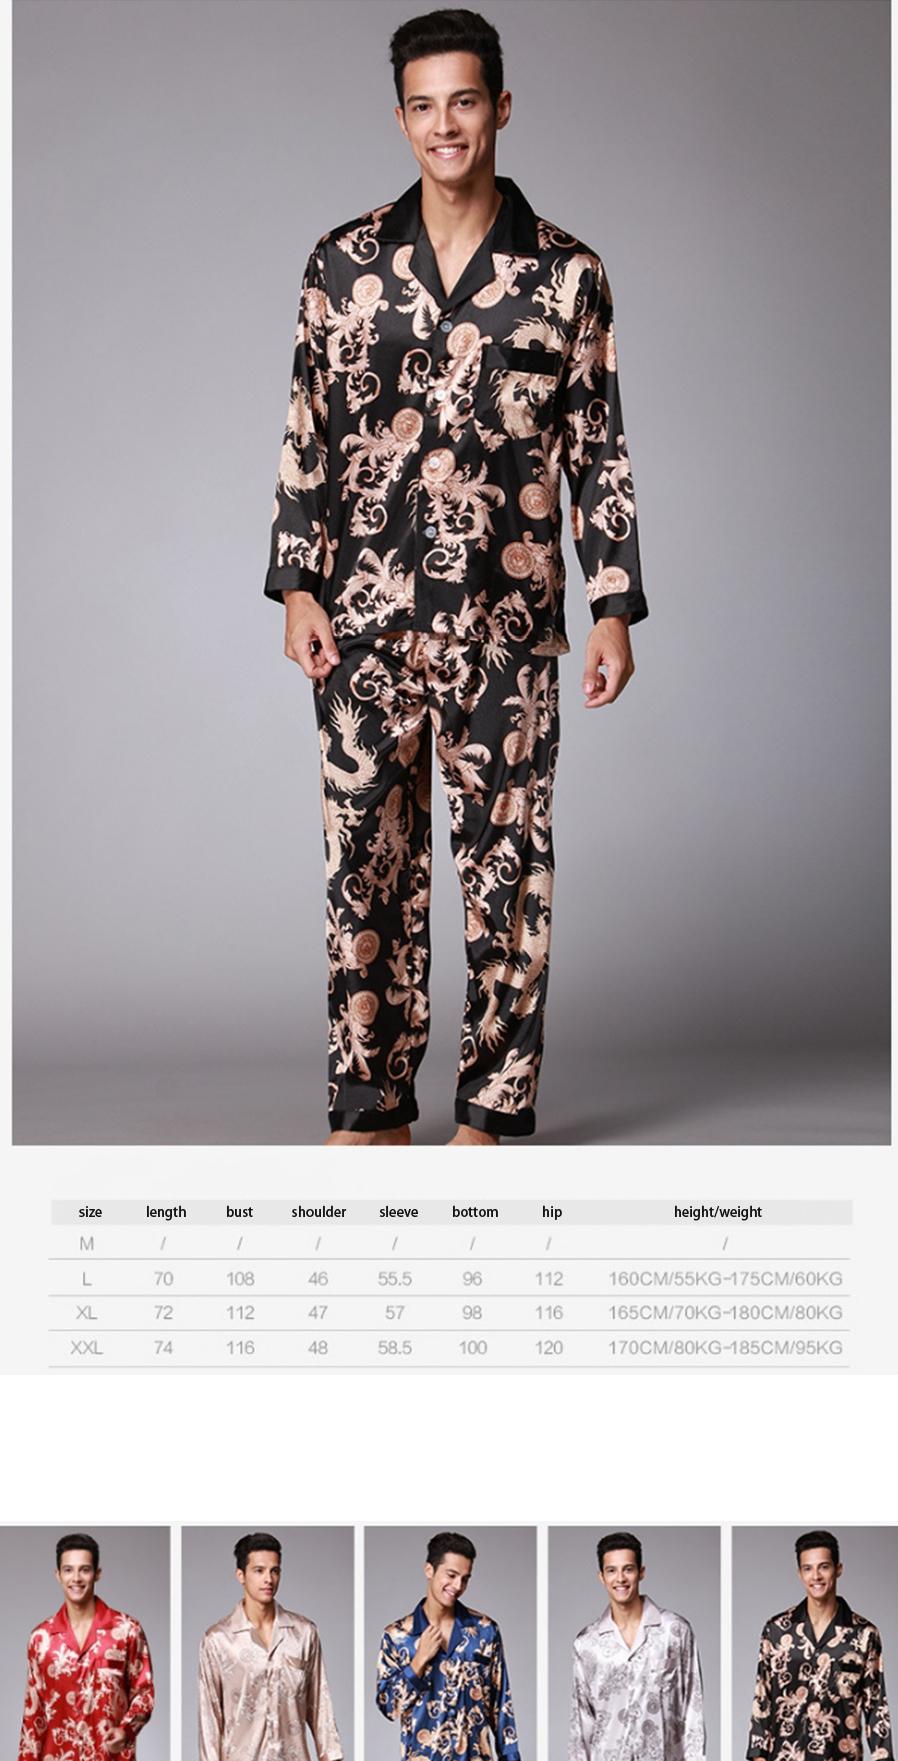 53eaae18ee Men's Stylish Pajama Set Pajamas Sleepwear Long Sleeves Shirt + ...